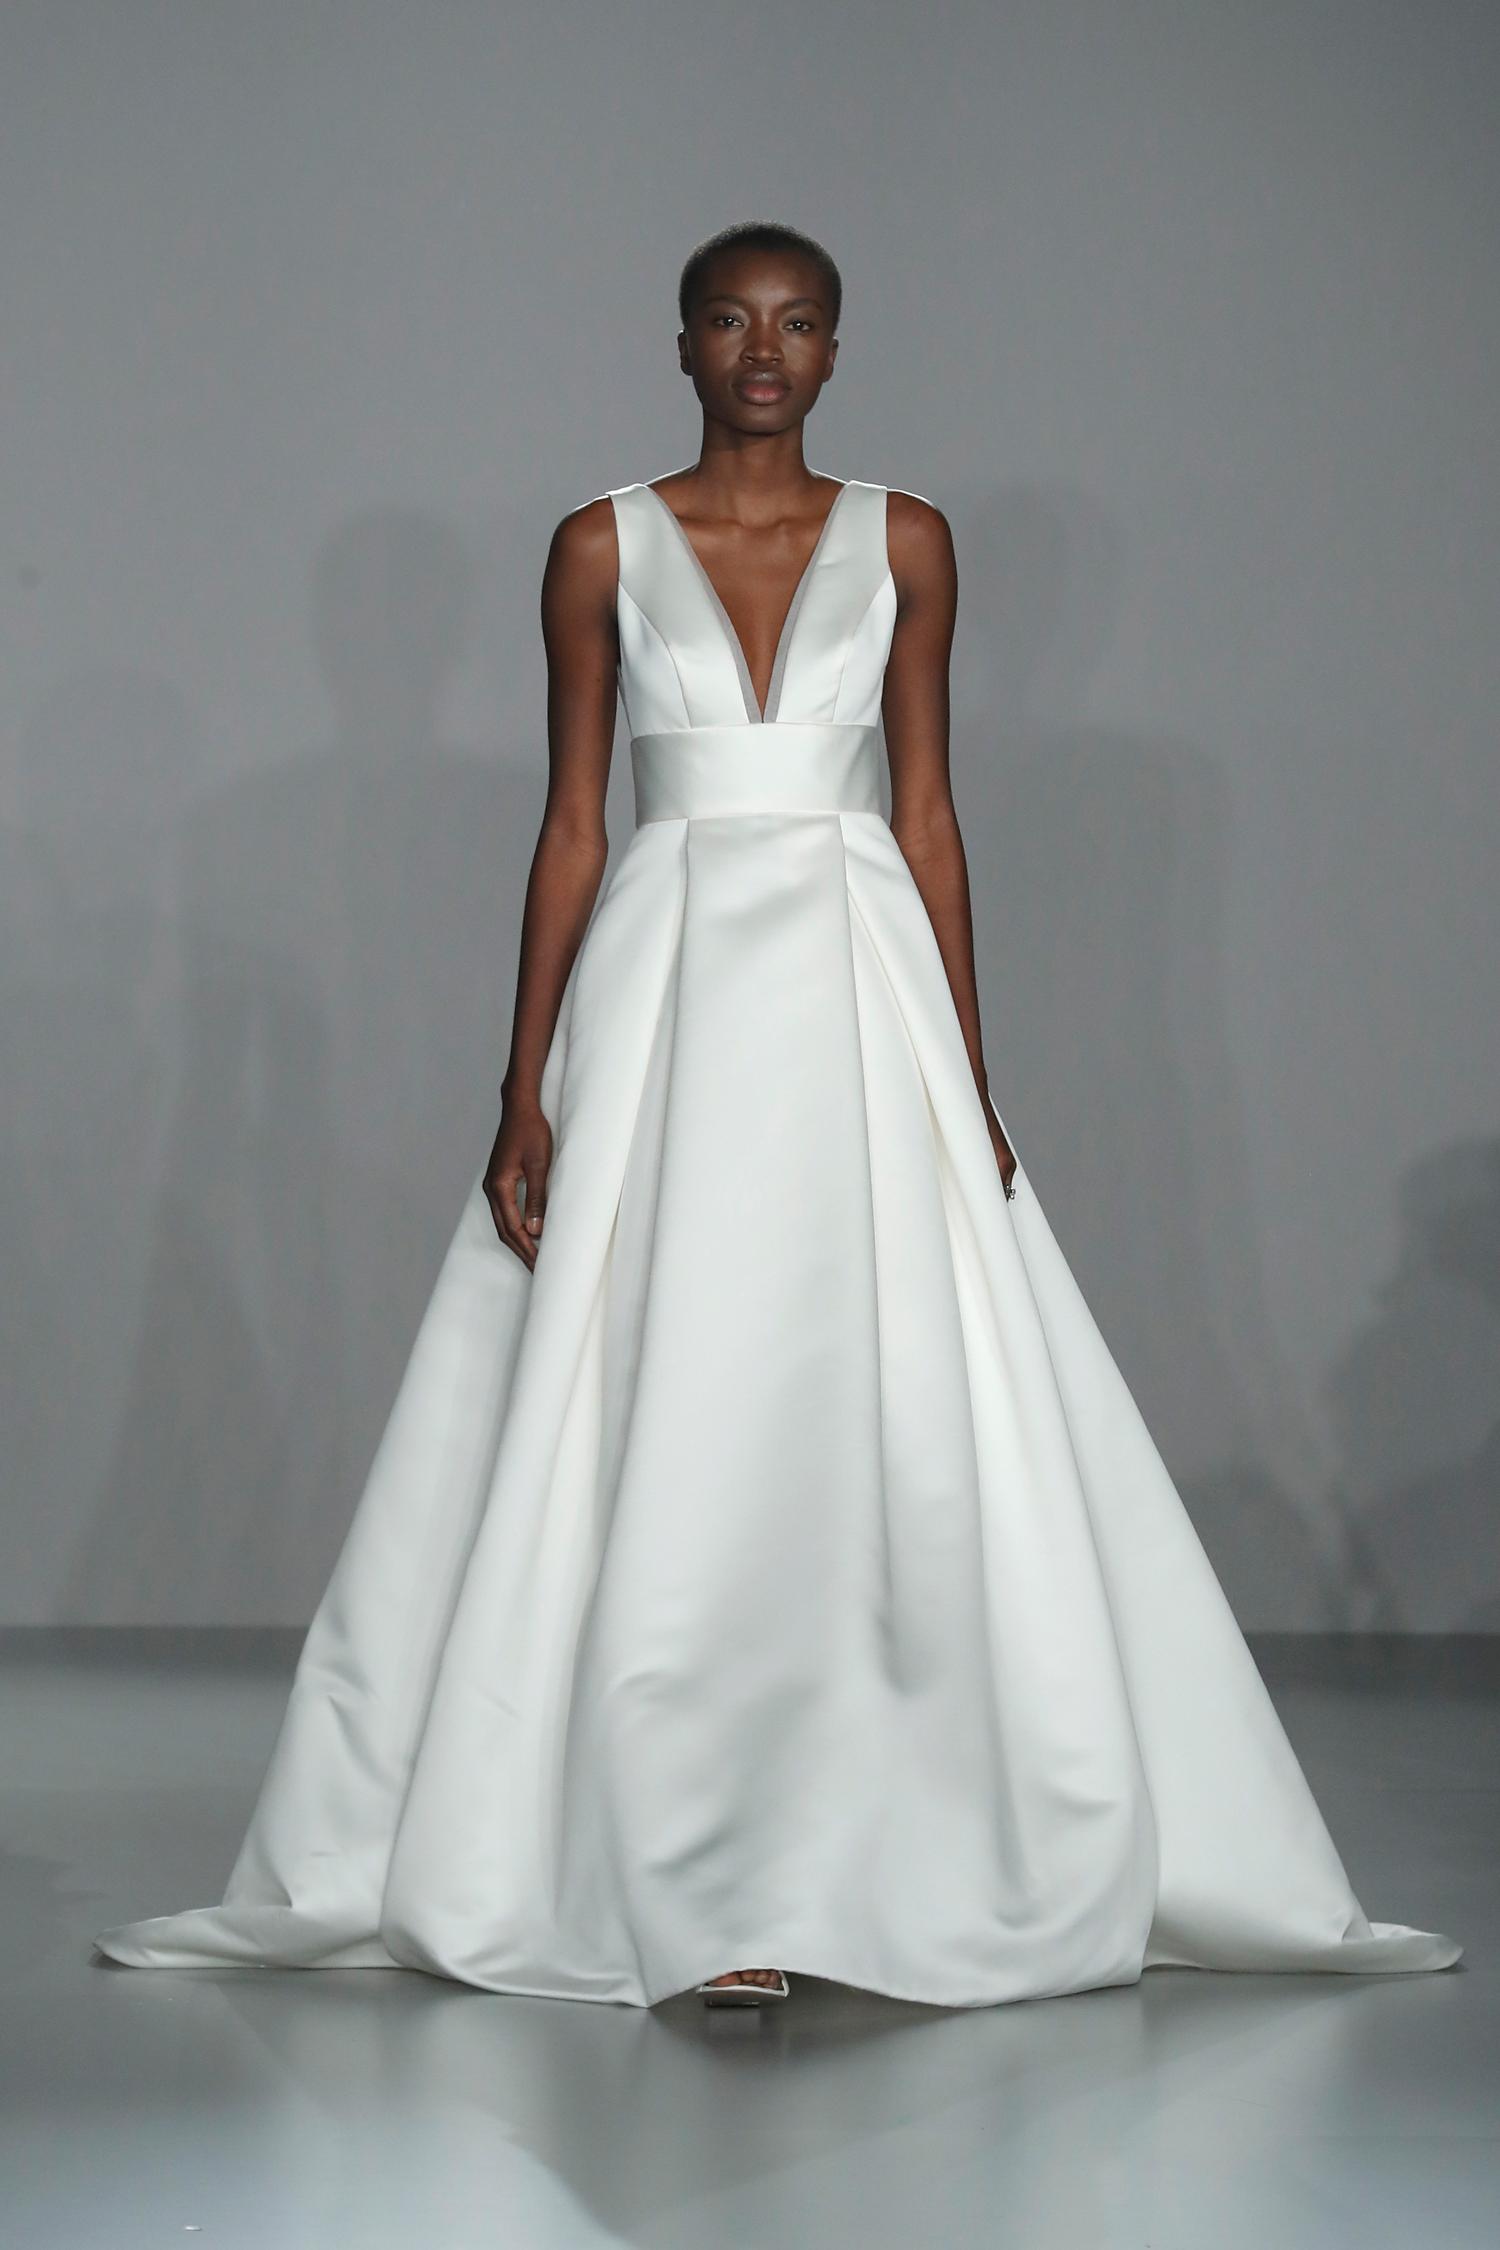 nouvelle amsale sleeveless v-neck ballgown wedding dress spring 2020